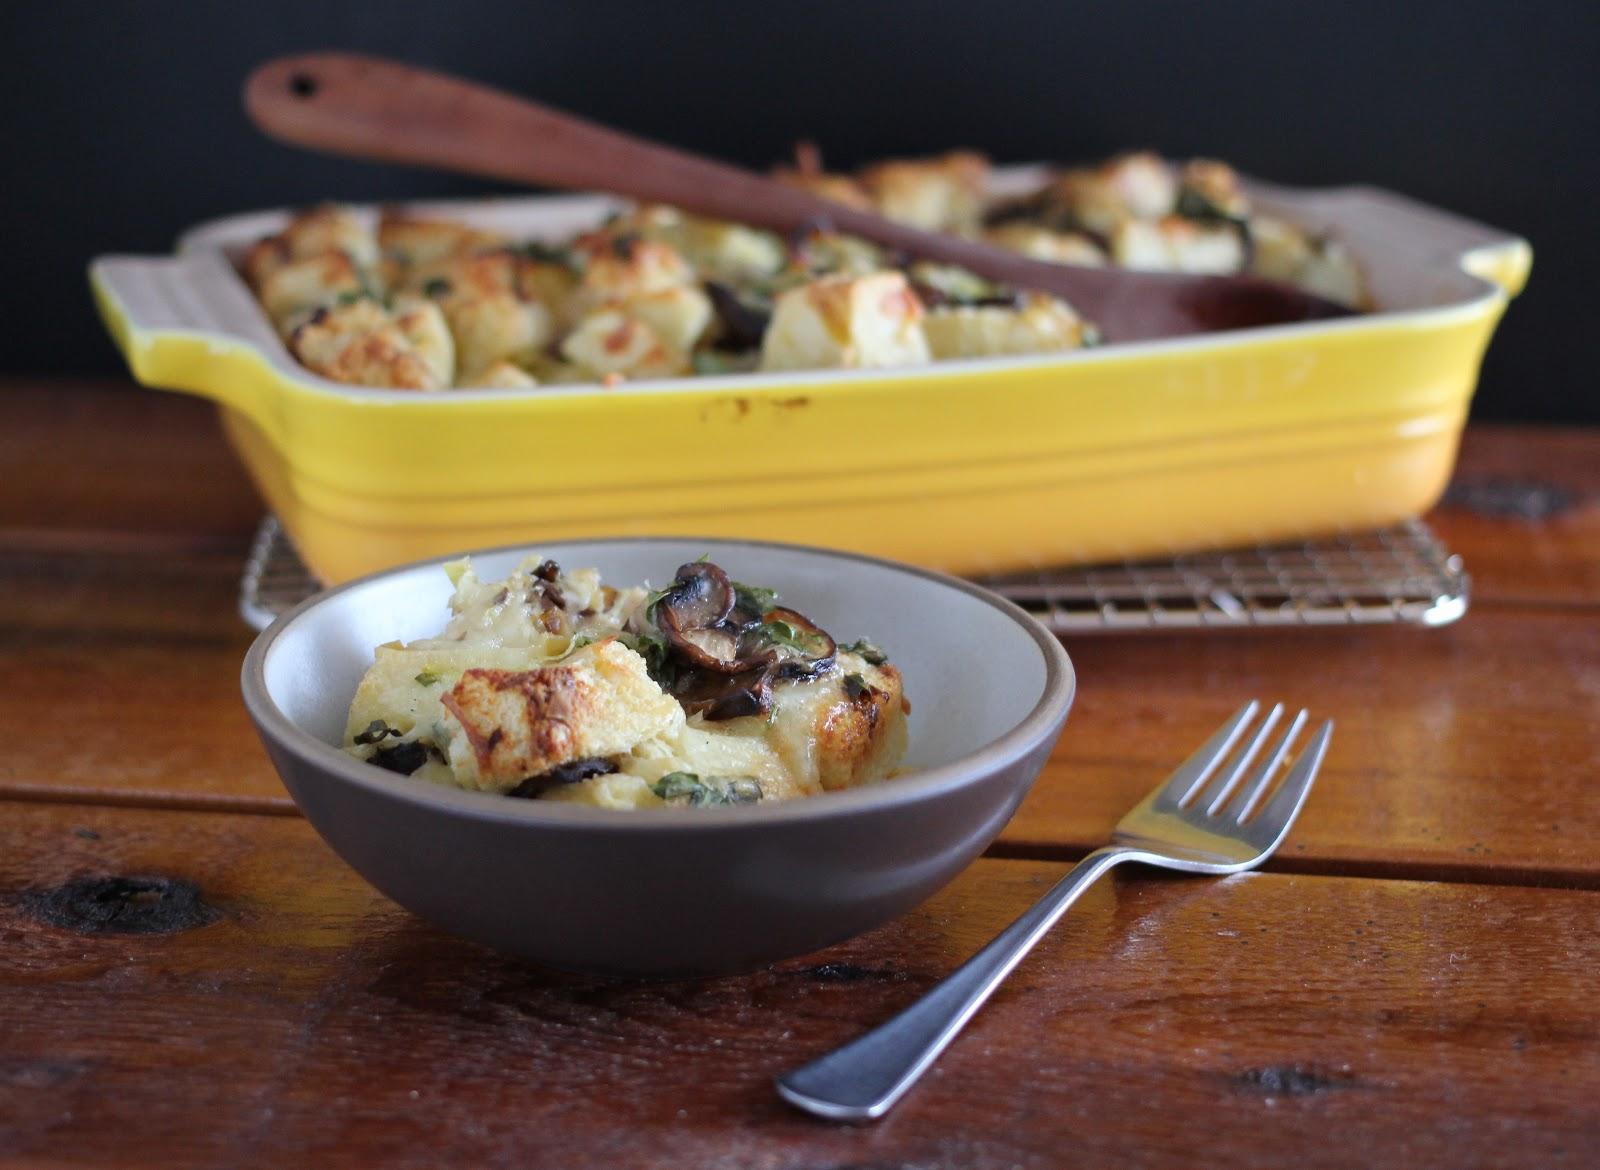 Arctic Garden Studio: Leek and Mushroom Bread Pudding